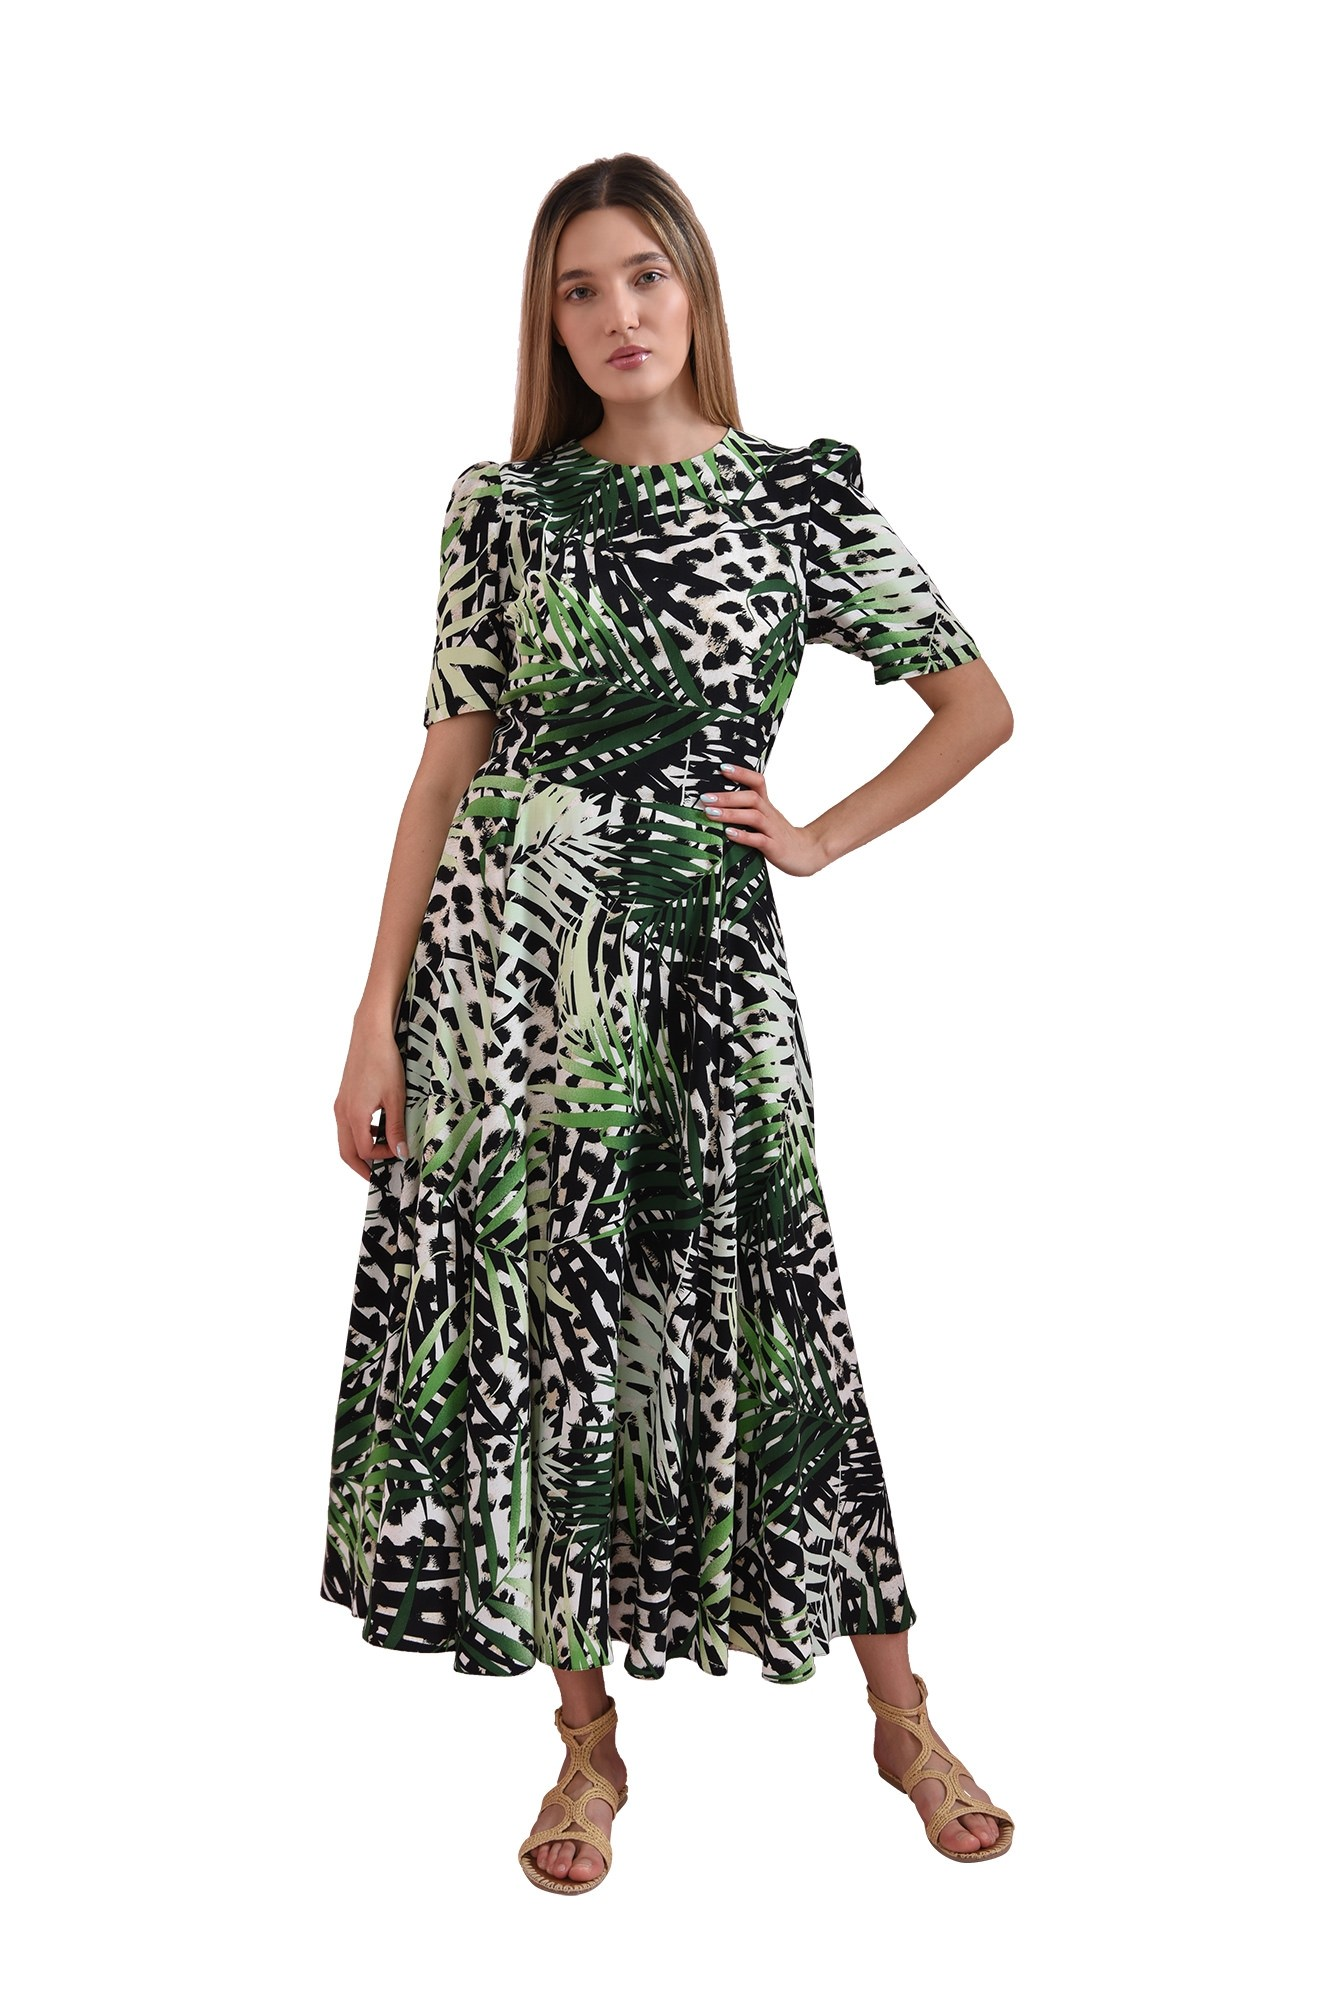 rochie evazata, cu maneca lunga